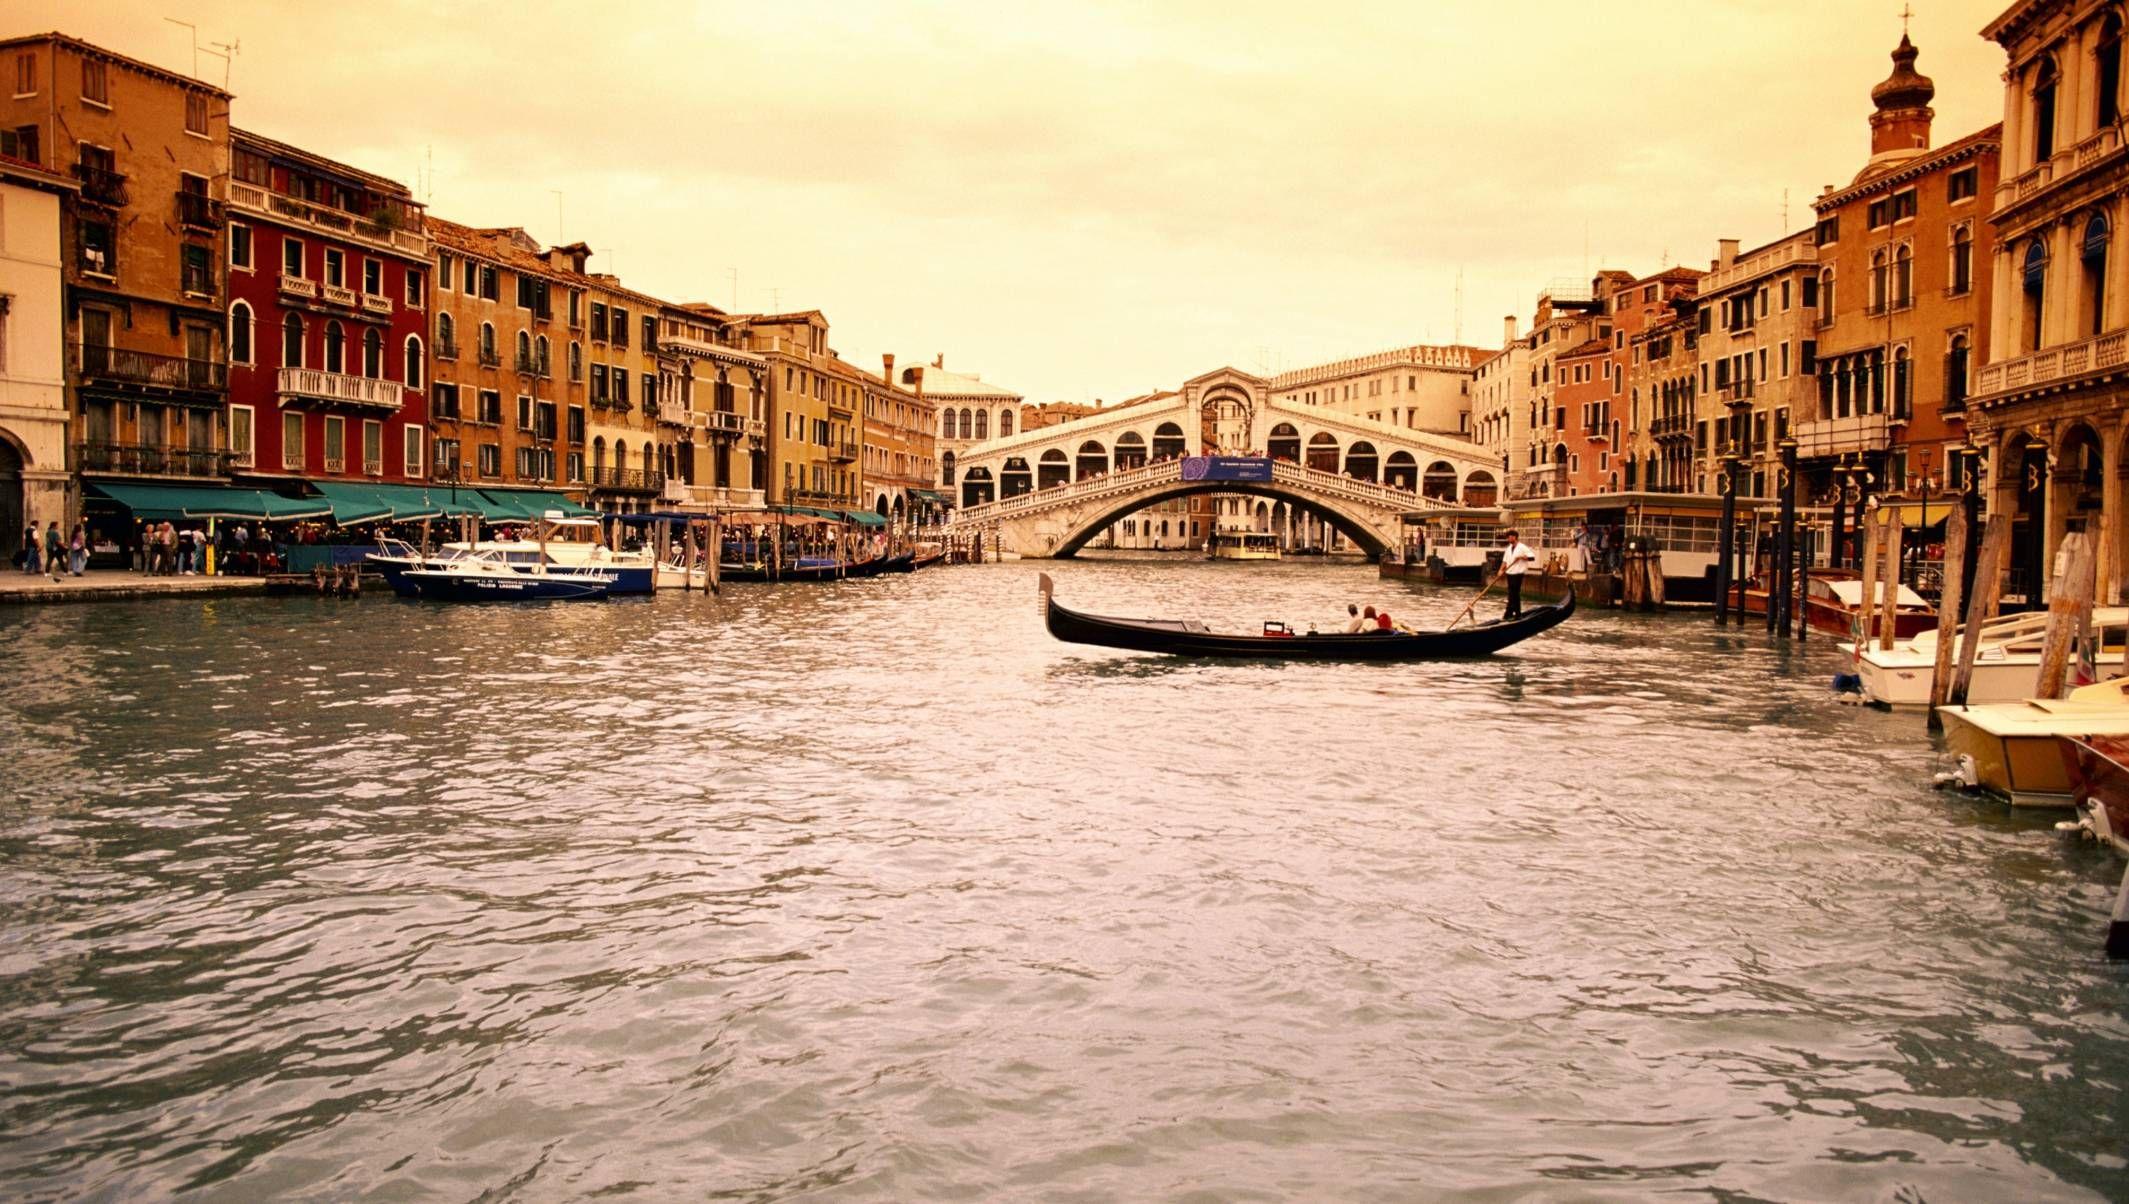 Italy Venice Wallpaper Hd Download For Desktop High Quality 1024 768 Venice Wallpaper 41 Wallpapers Adorable Wallp Travel Travel Europe Cheap Venice Travel